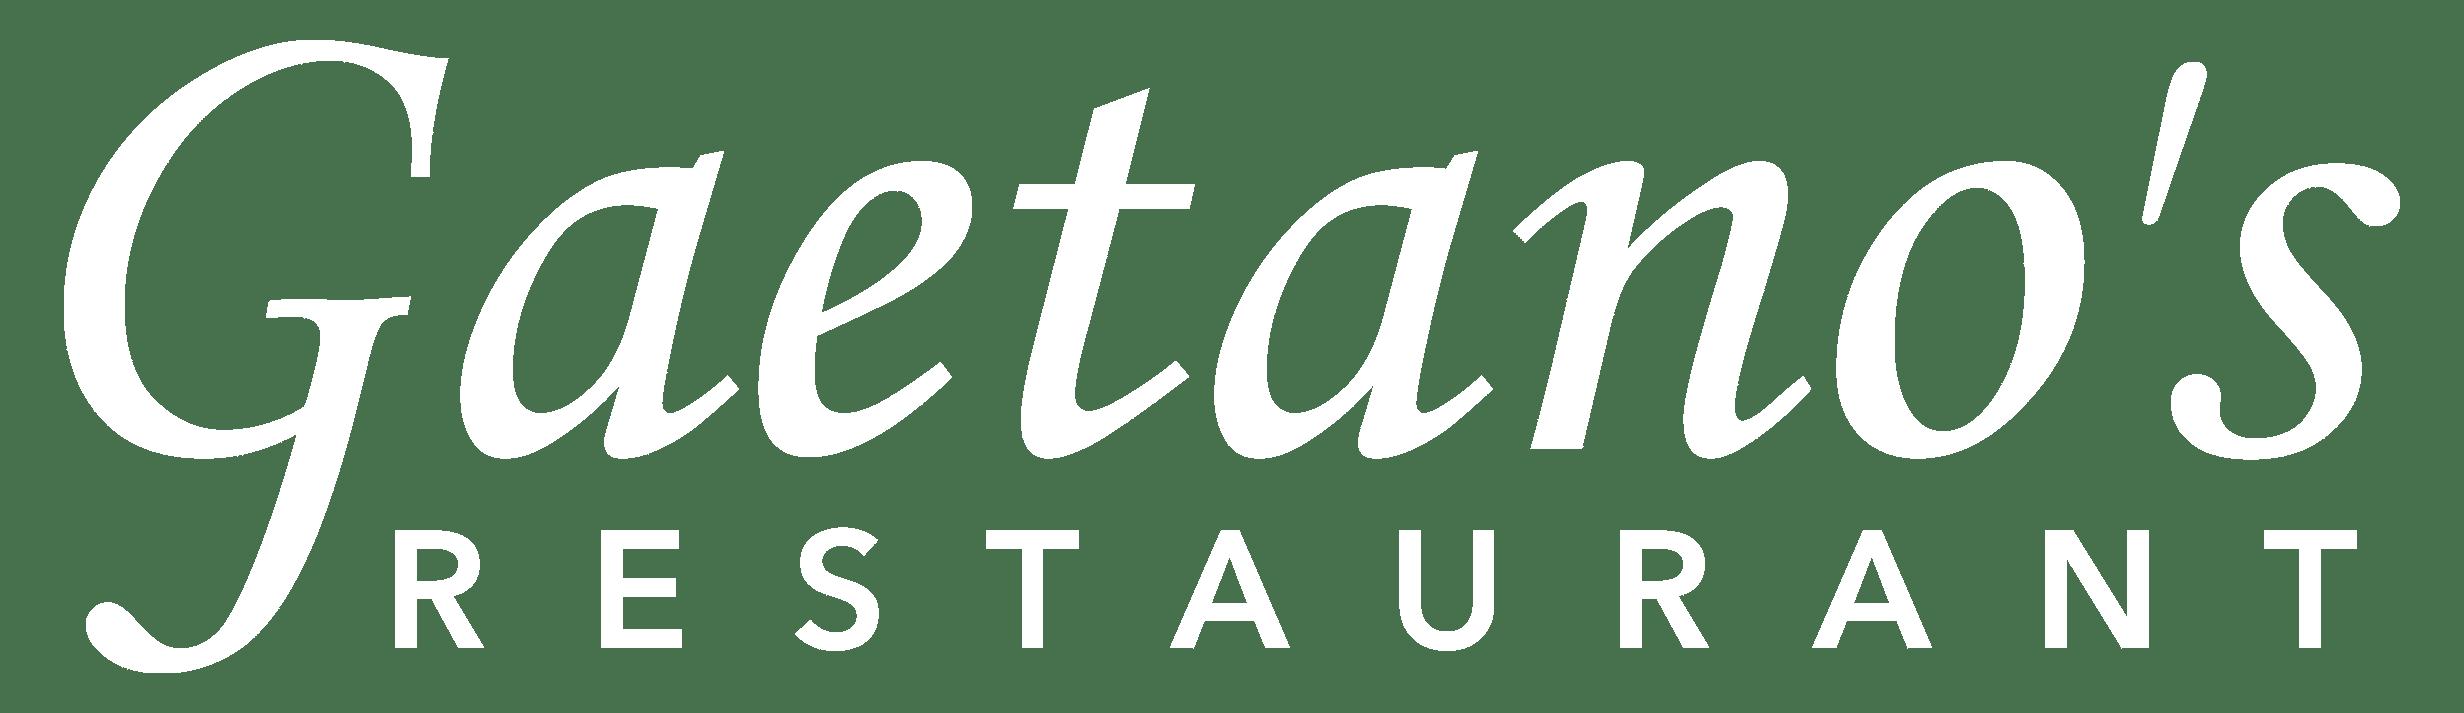 Gaetano's Italian Restaurant